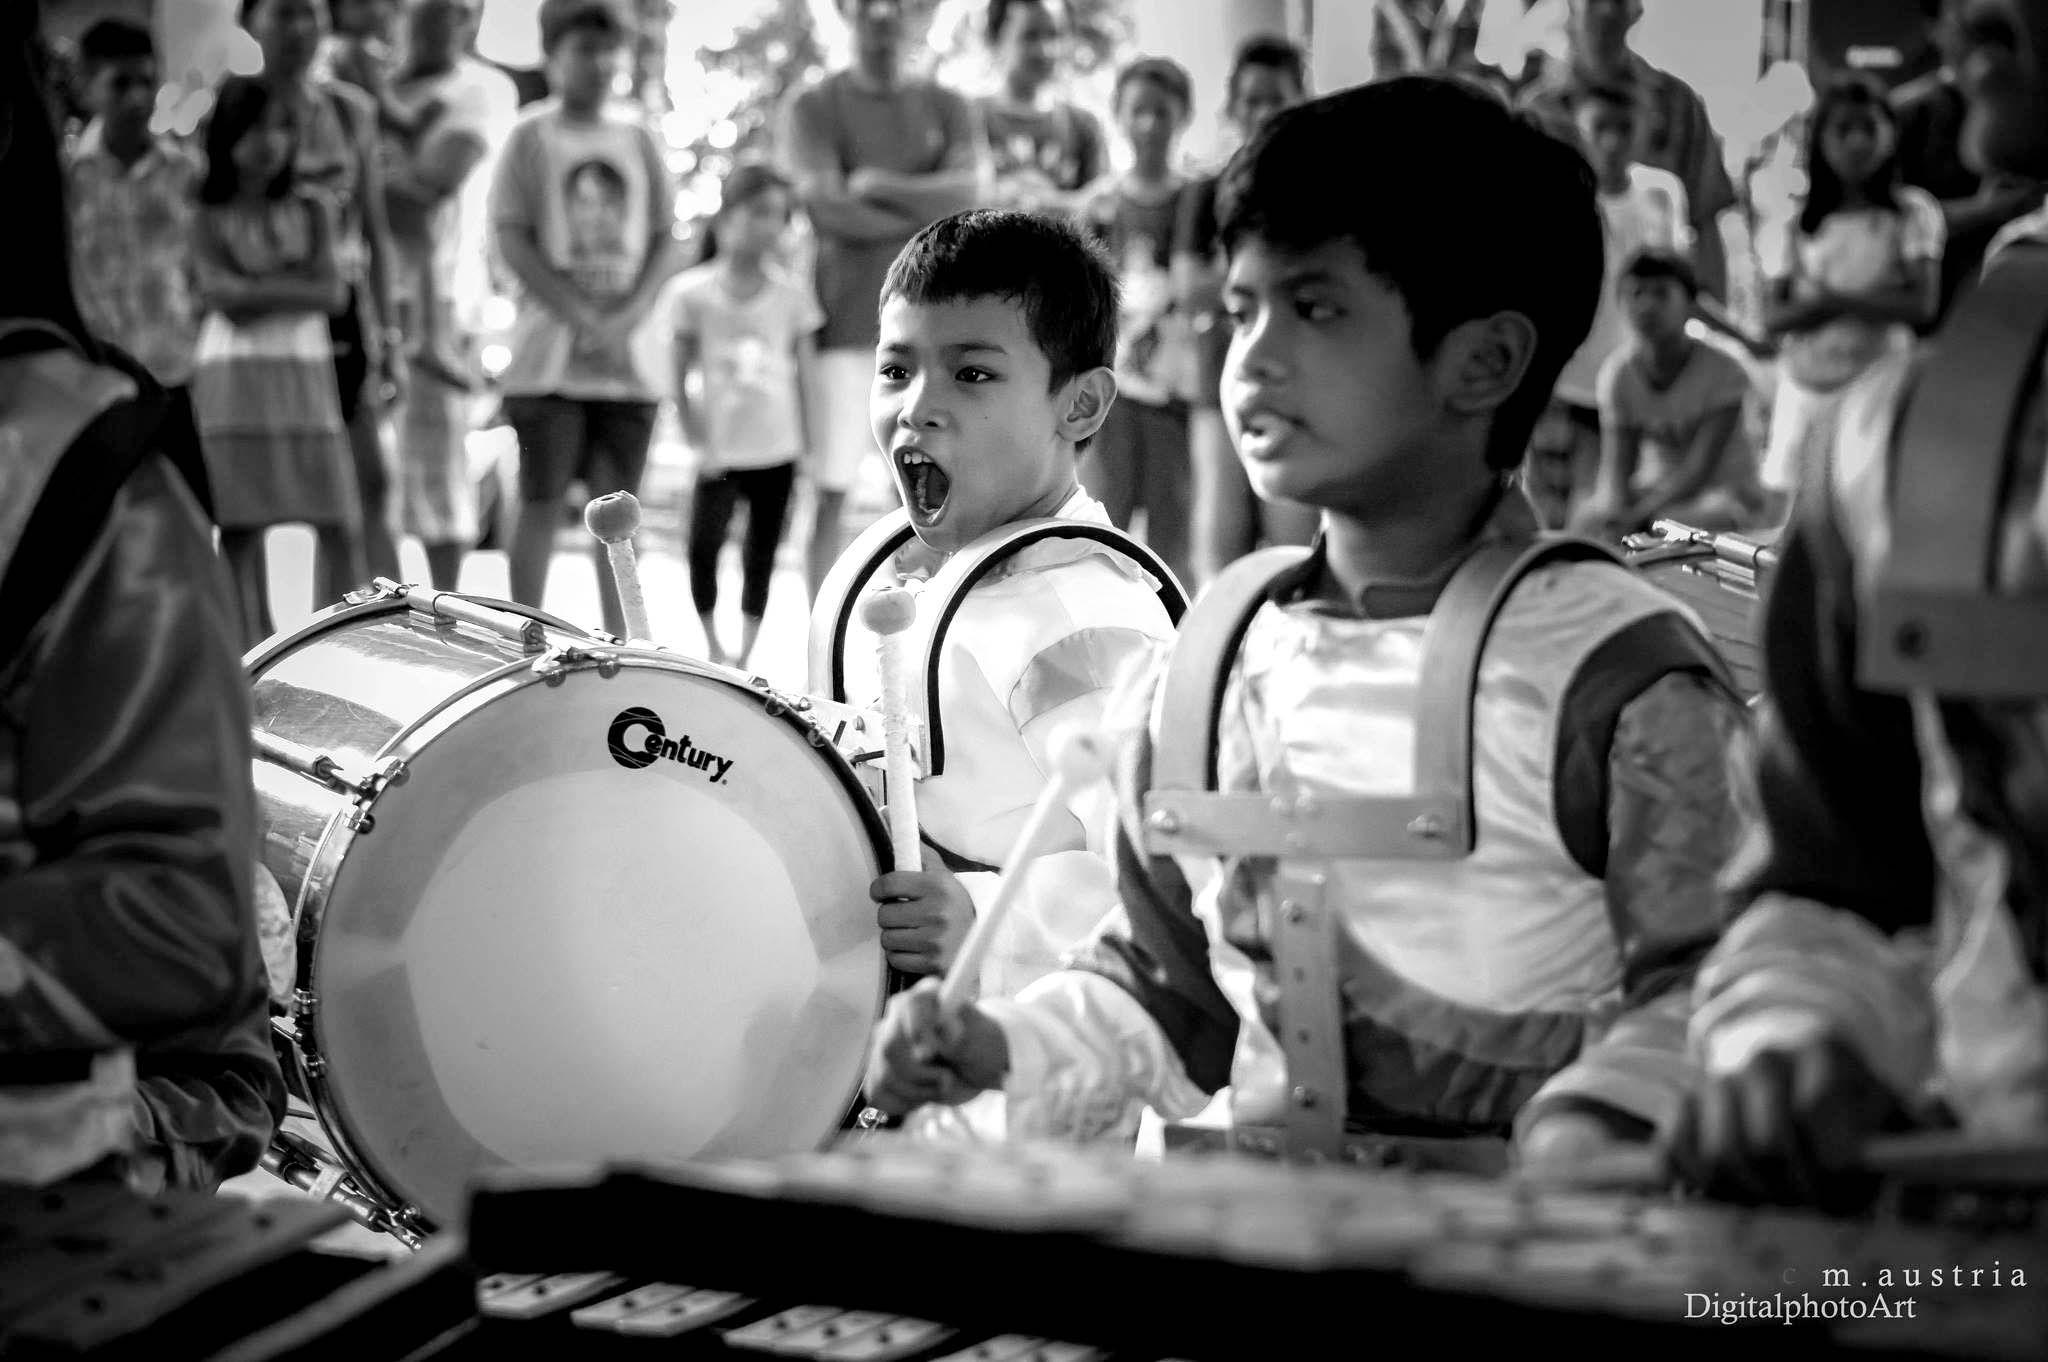 Little Drummer Boy by moises austria